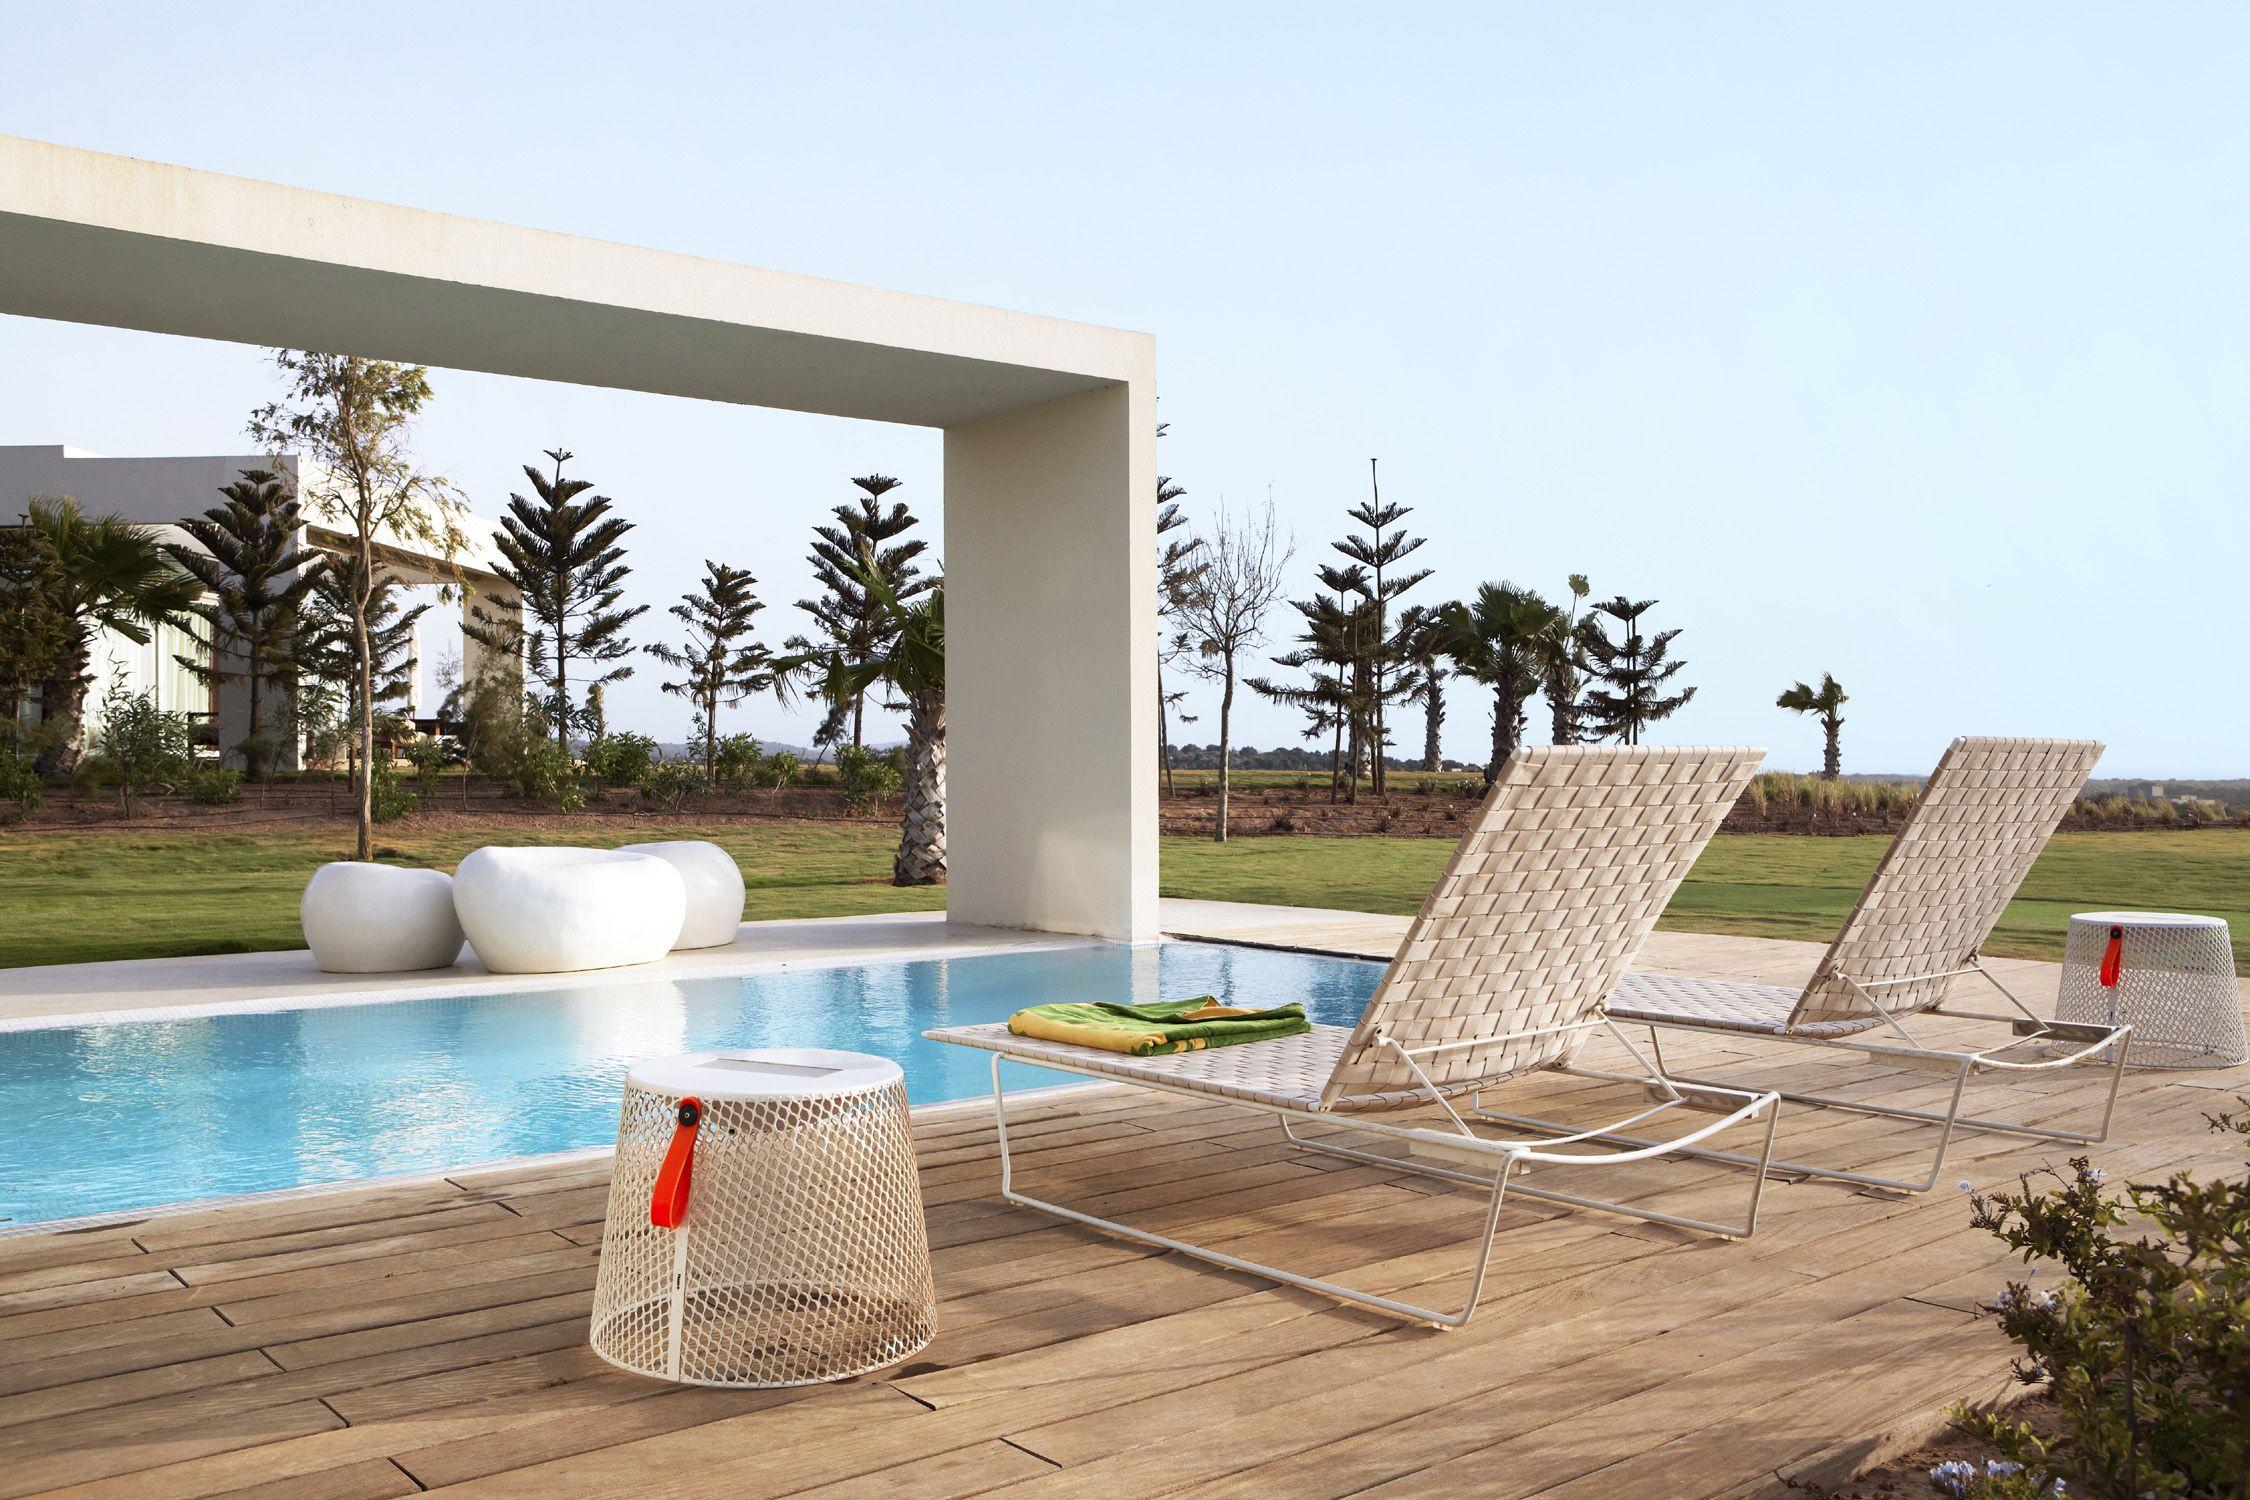 Introducing The Lacoste Villas At The Sofitel Essaouira Mogador